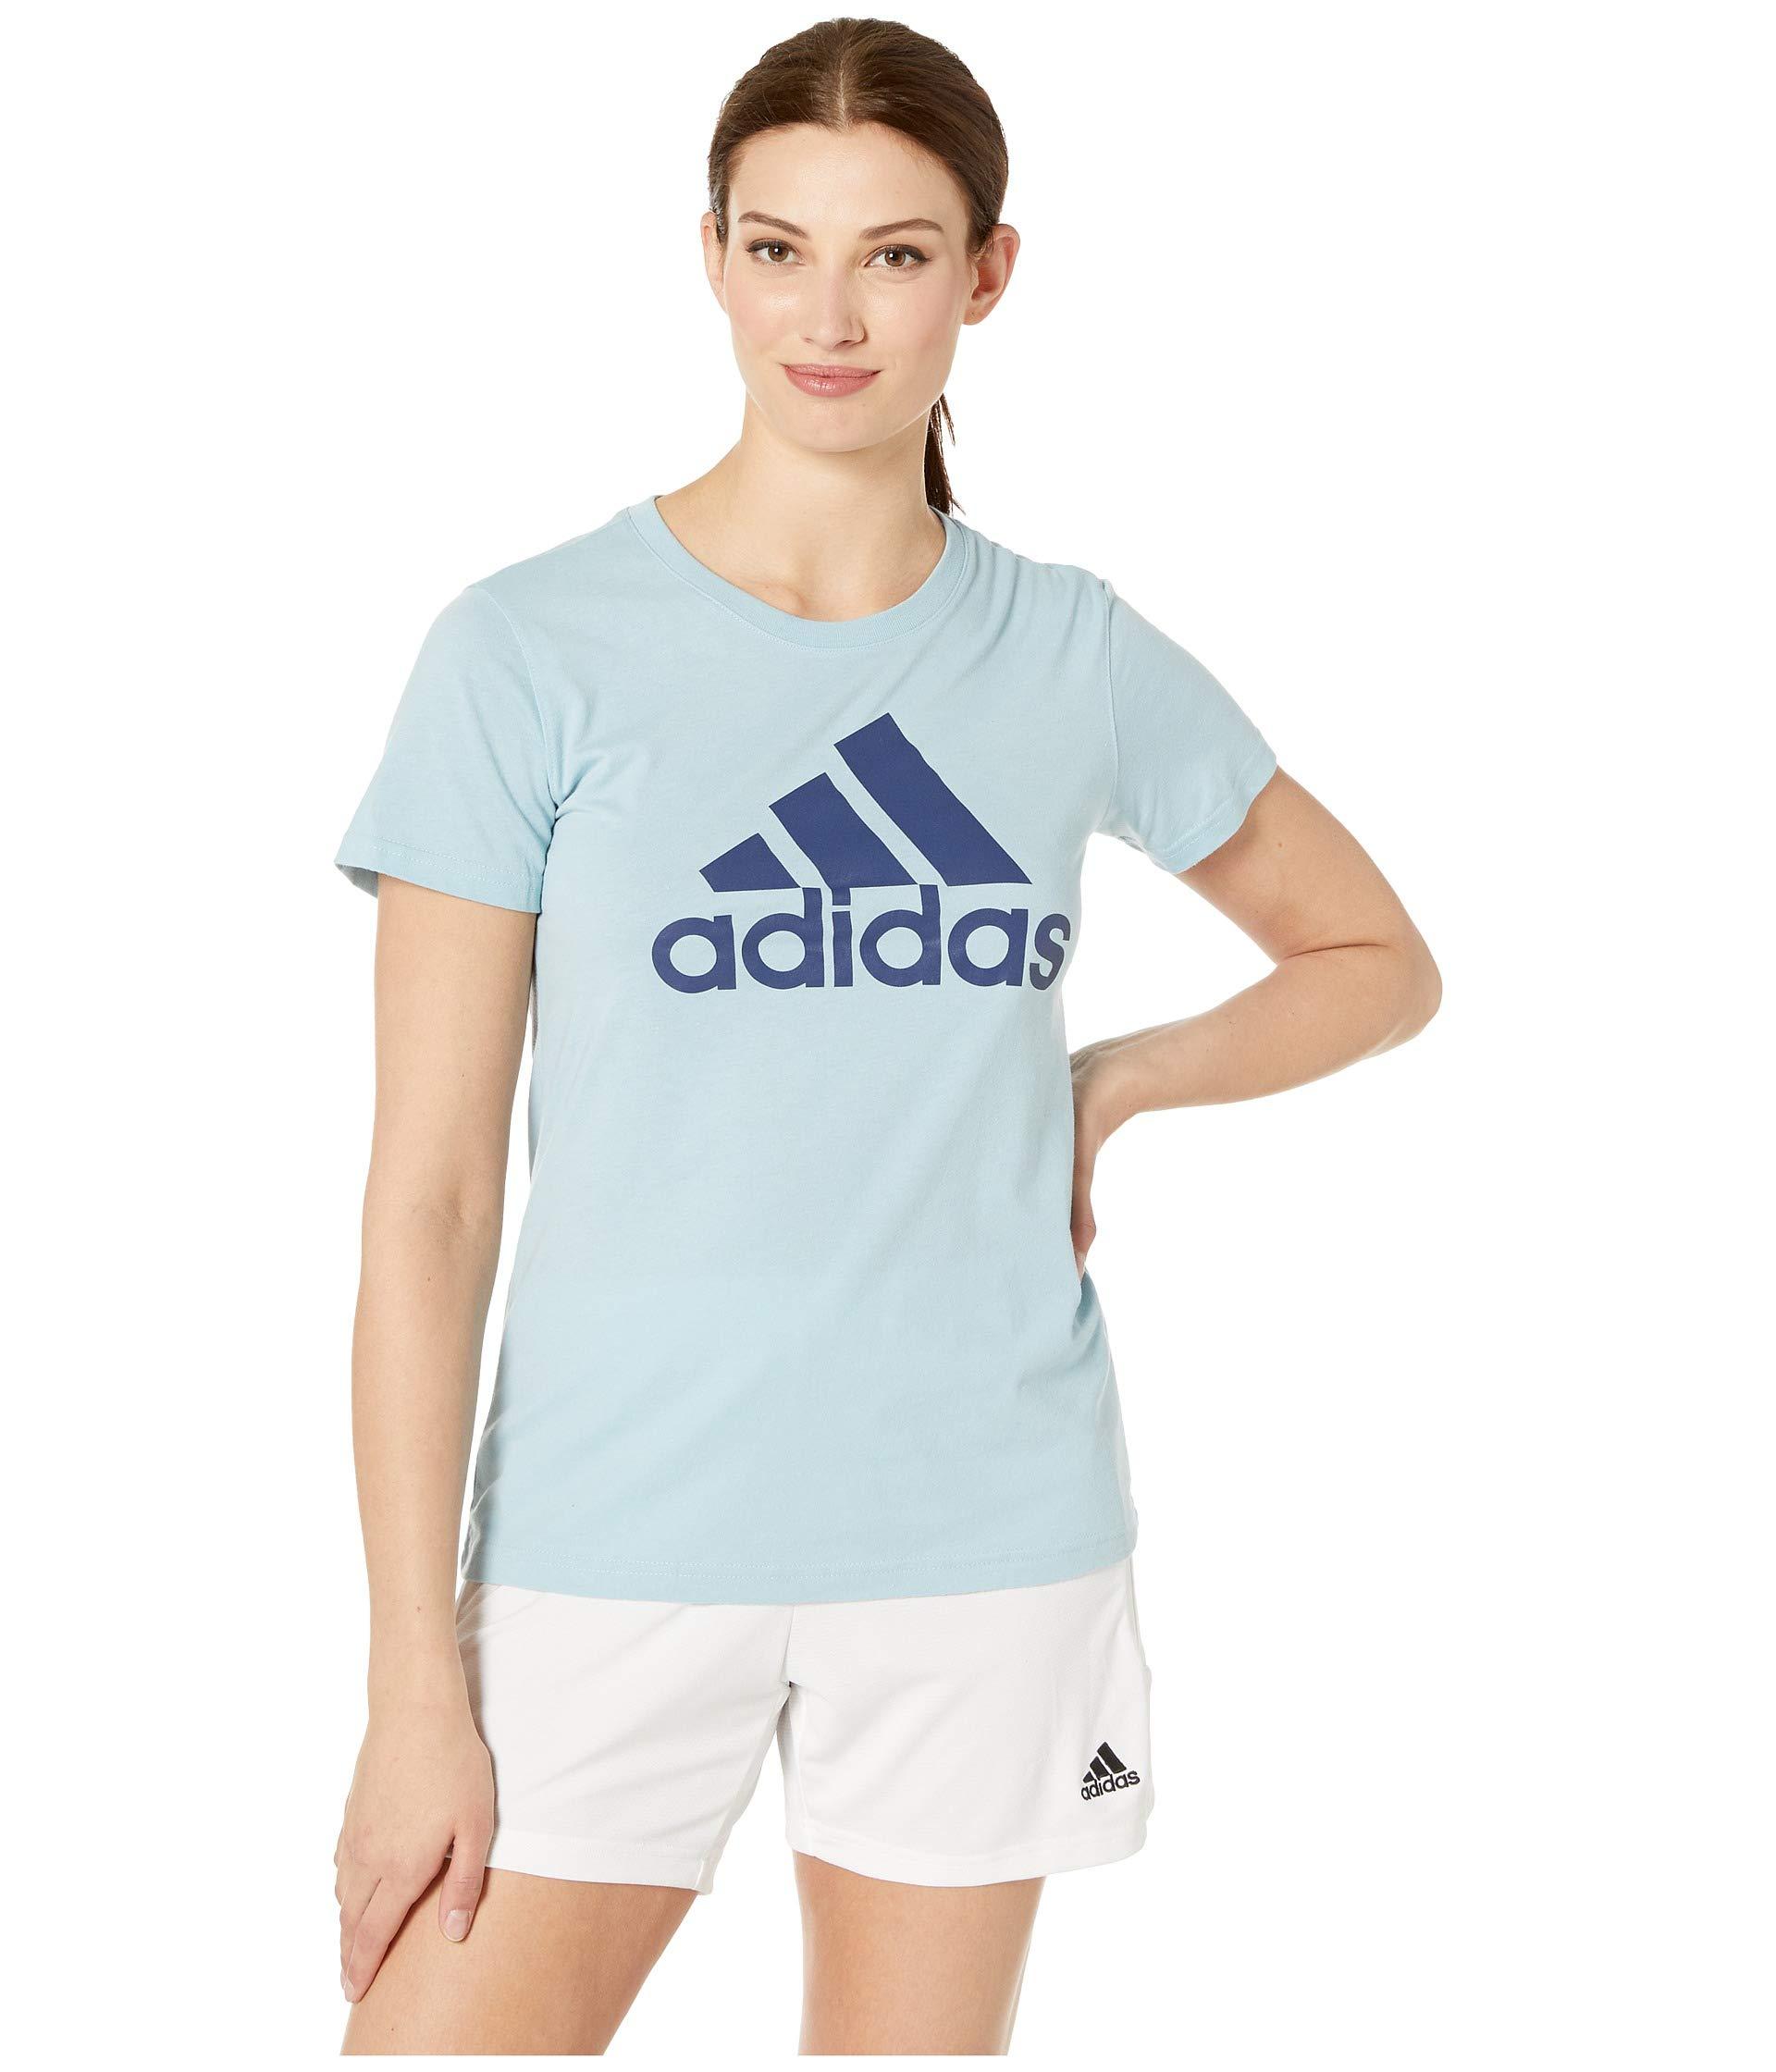 adidas Women's Badge of Sport Classic Tee Ash Grey/Noble Indigo Small by adidas